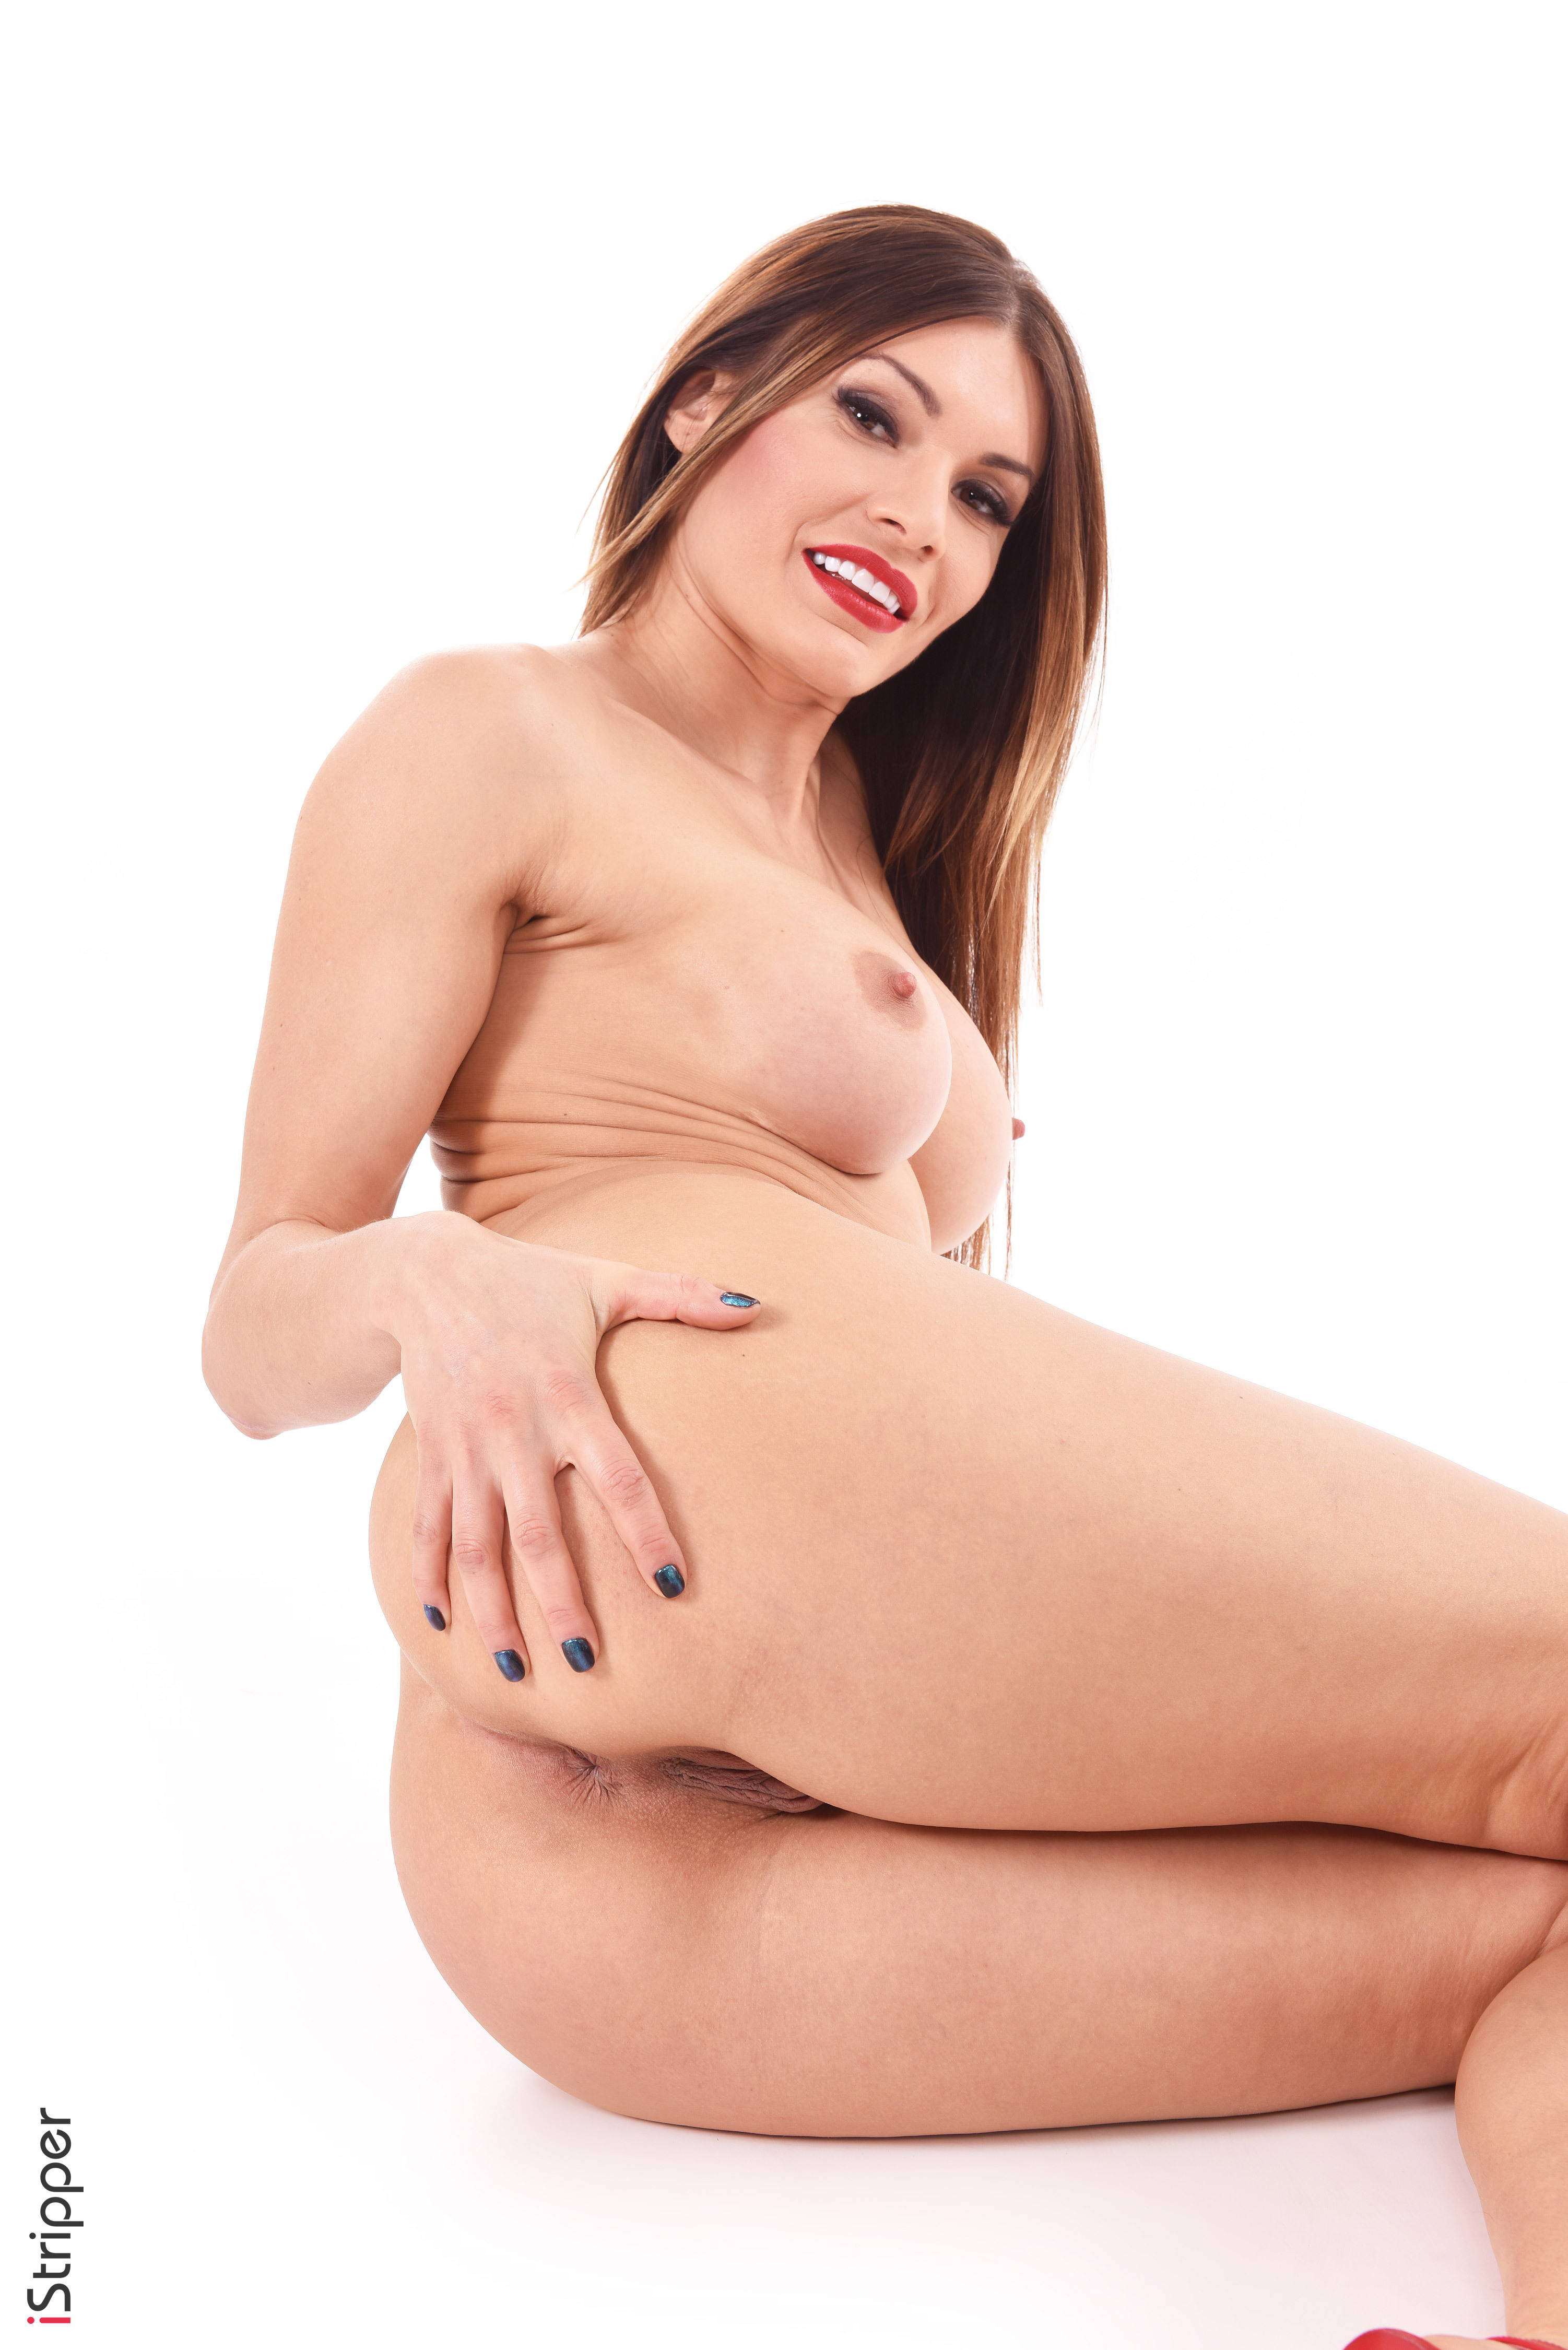 sexy ass hd wallpapers